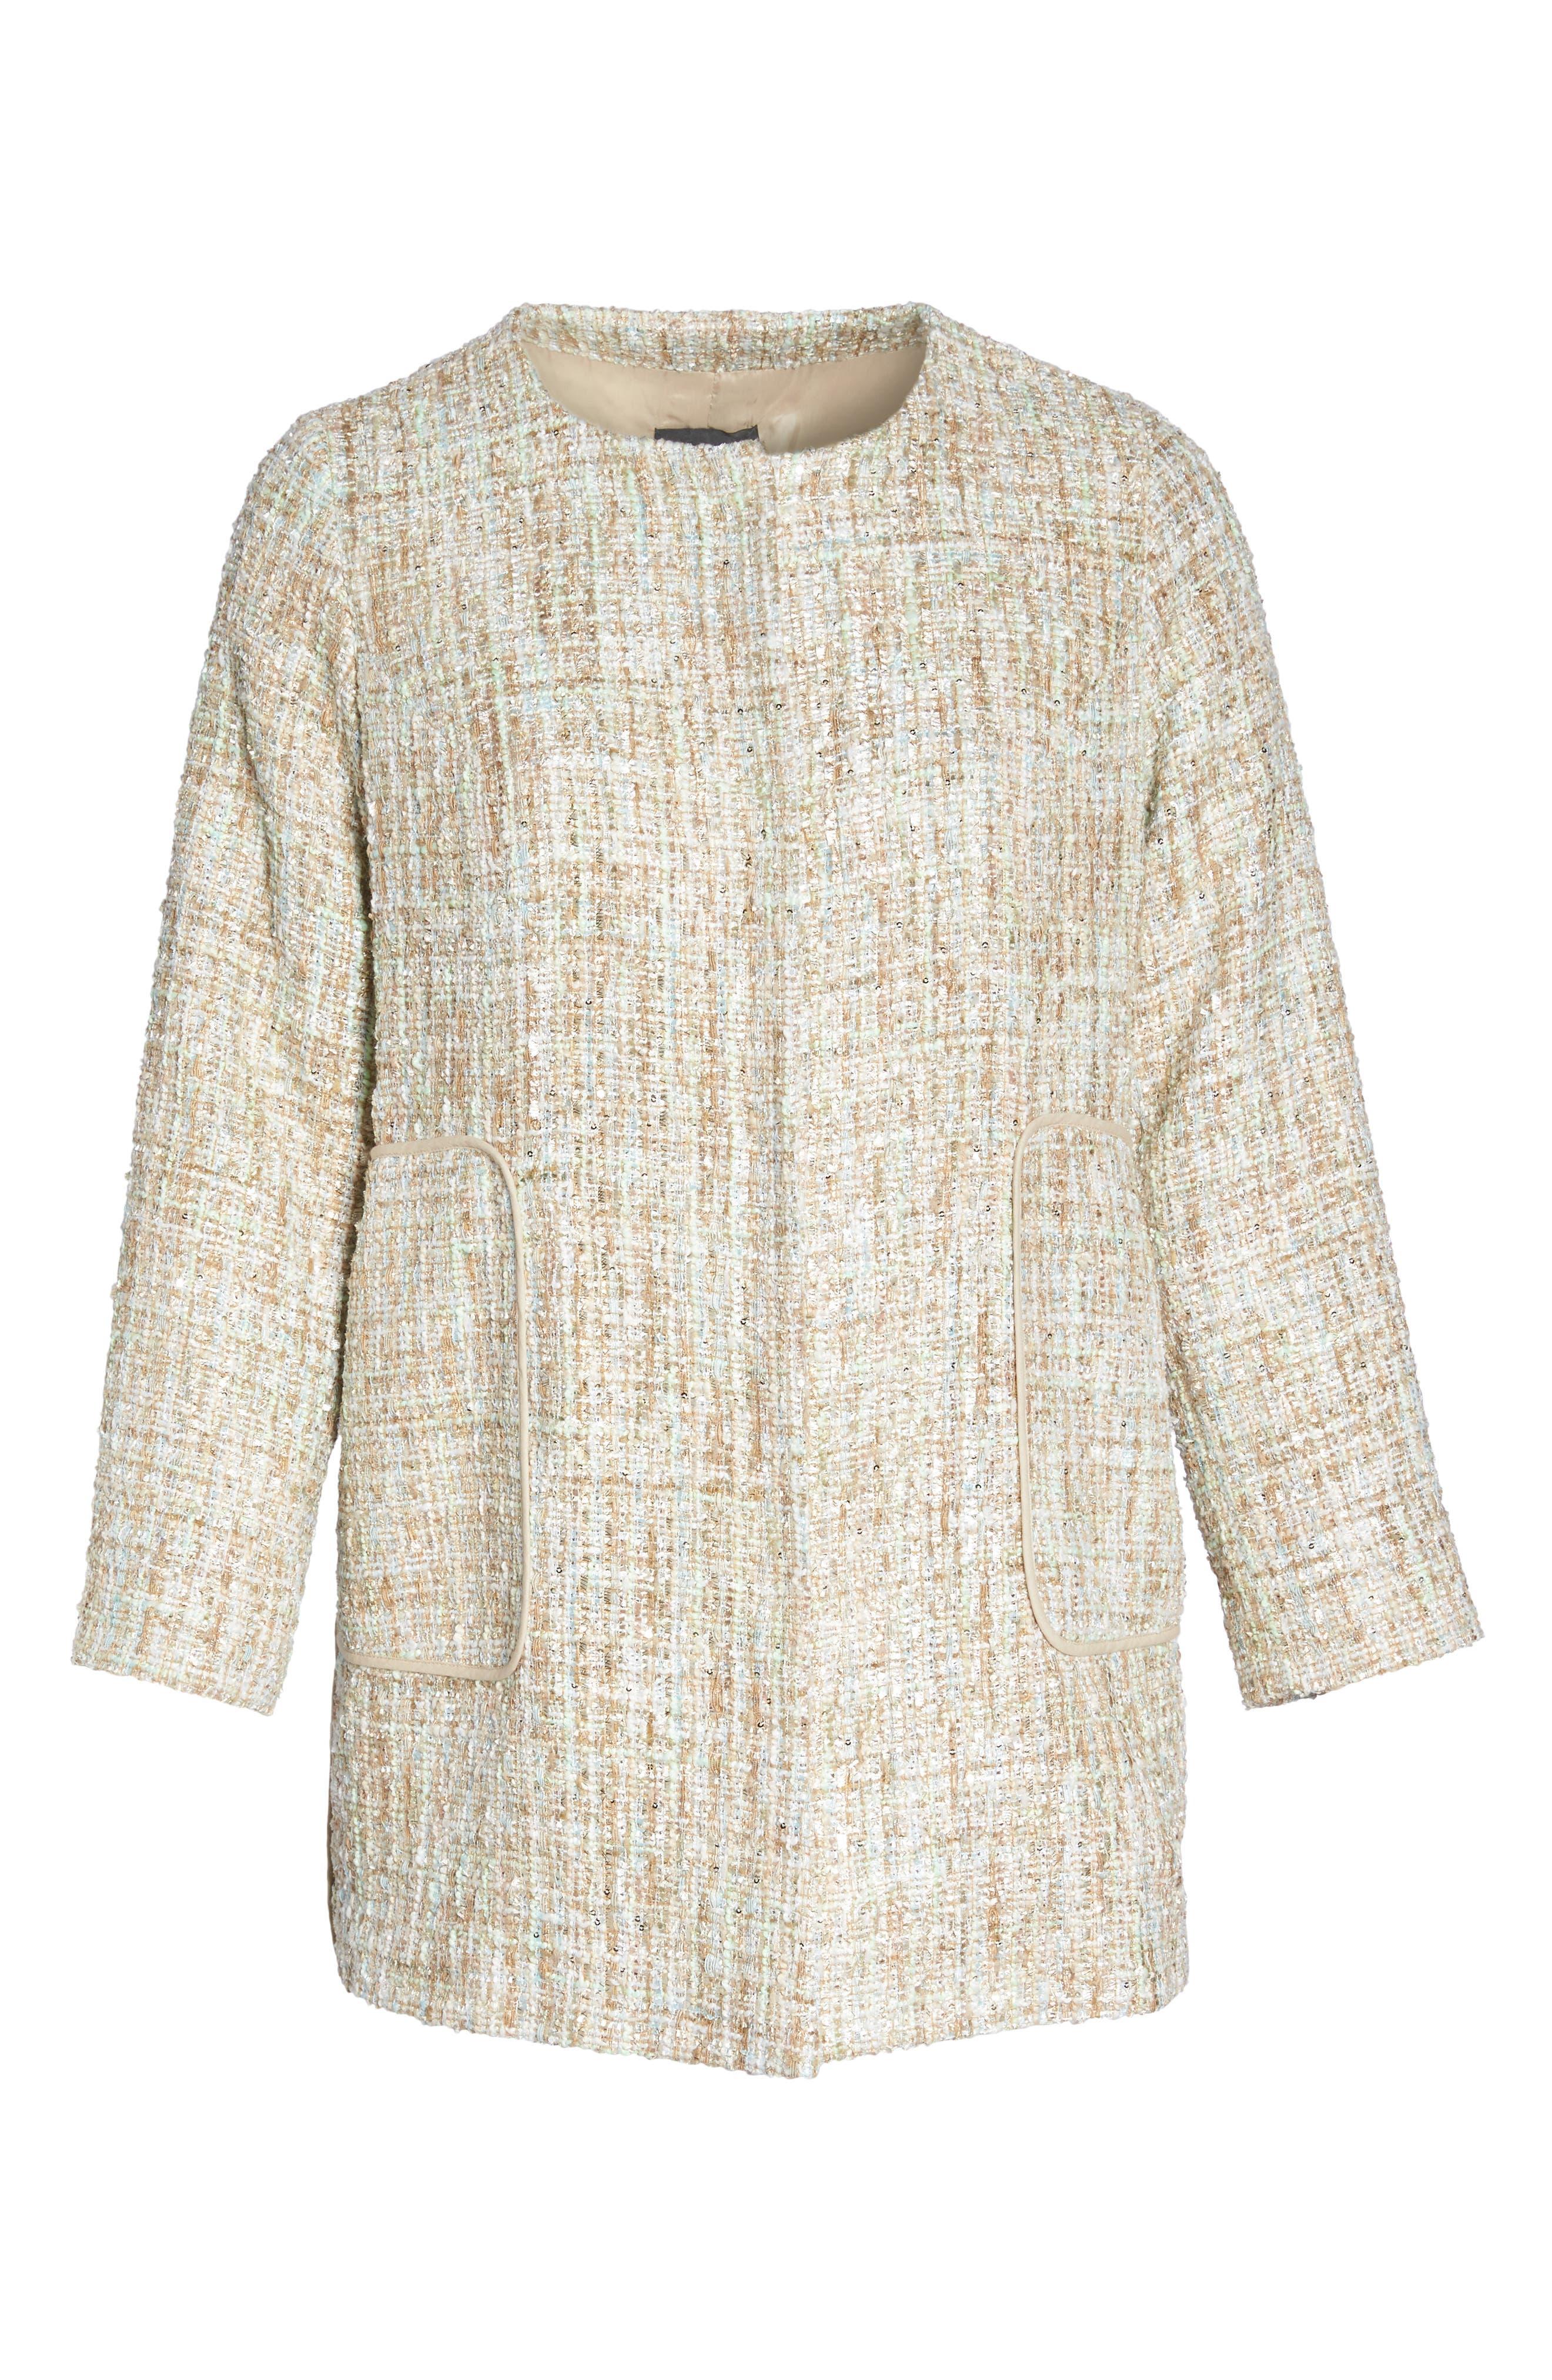 Metallic Tweed Jacket,                             Alternate thumbnail 6, color,                             901